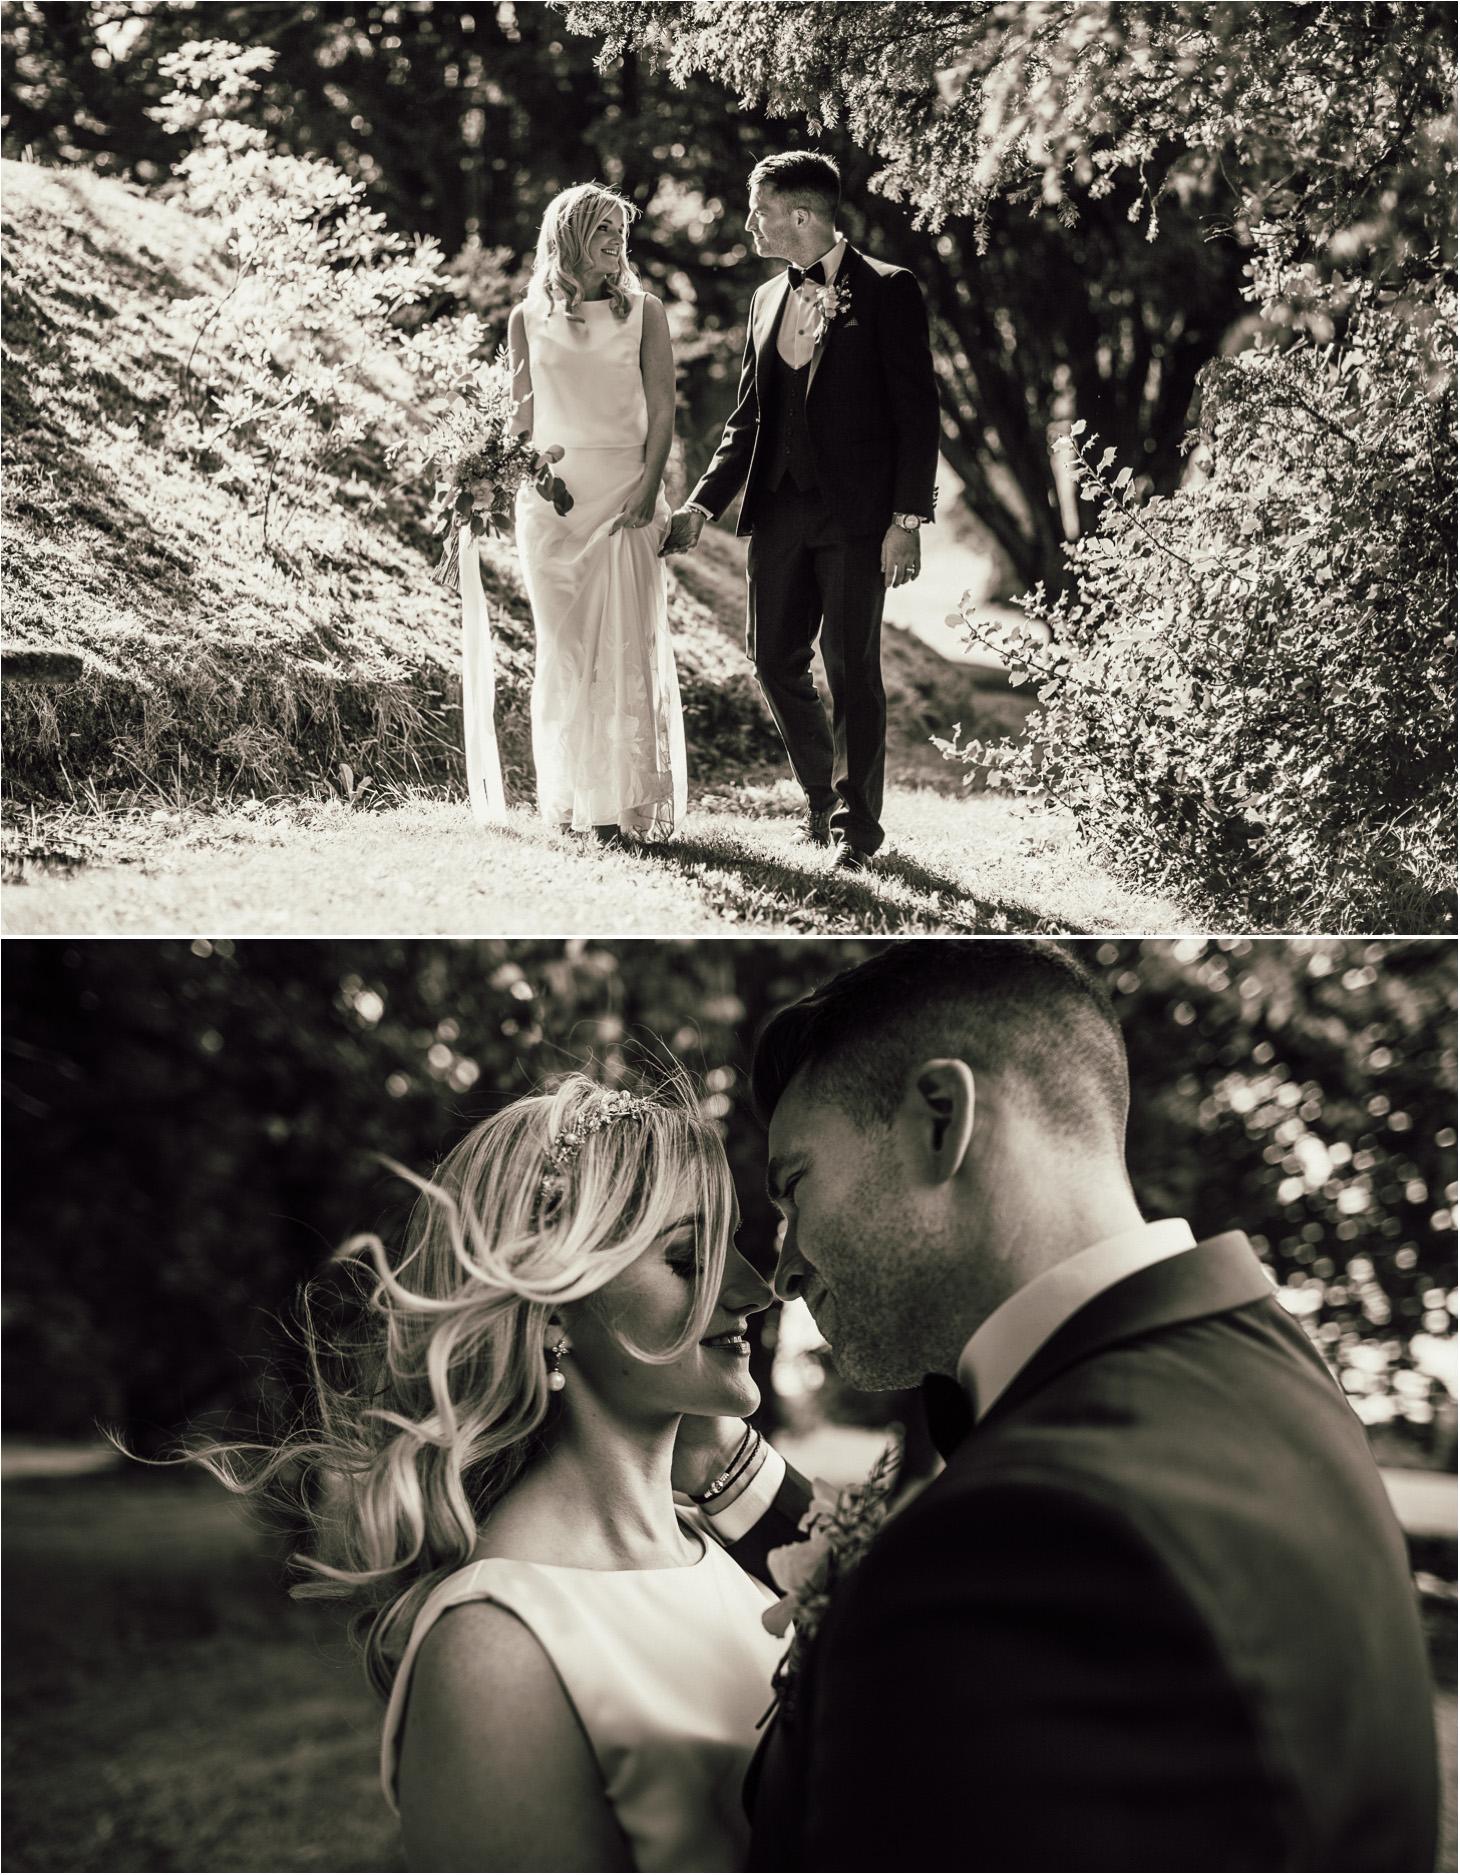 Virgina Lodge Photography. darren fitzpatrick. Wedding.19